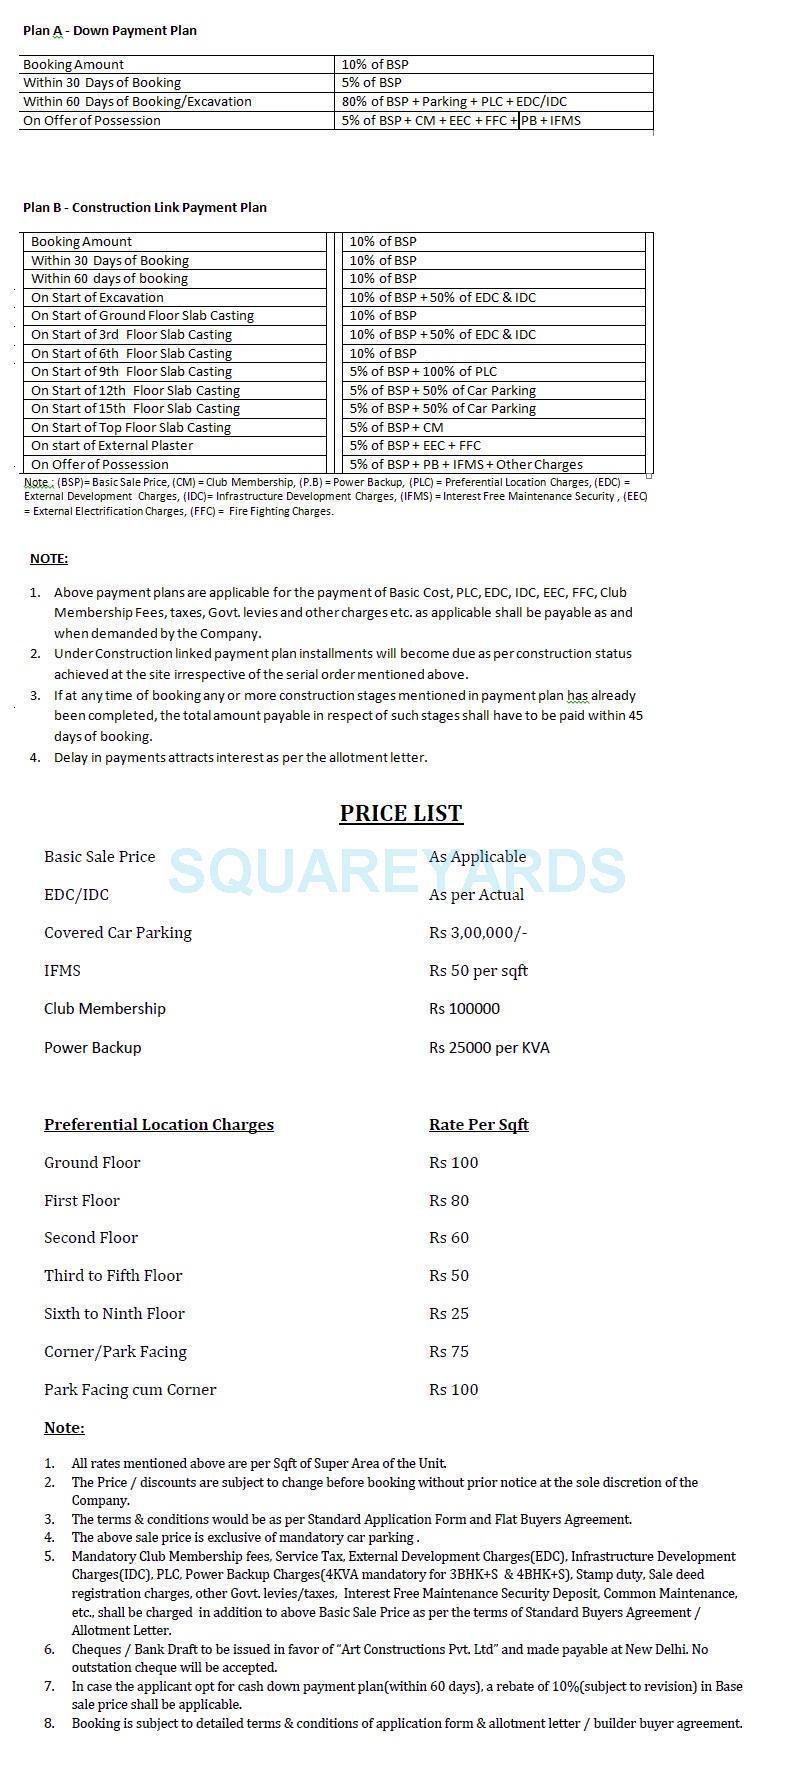 aakriti vastus payment plan image1